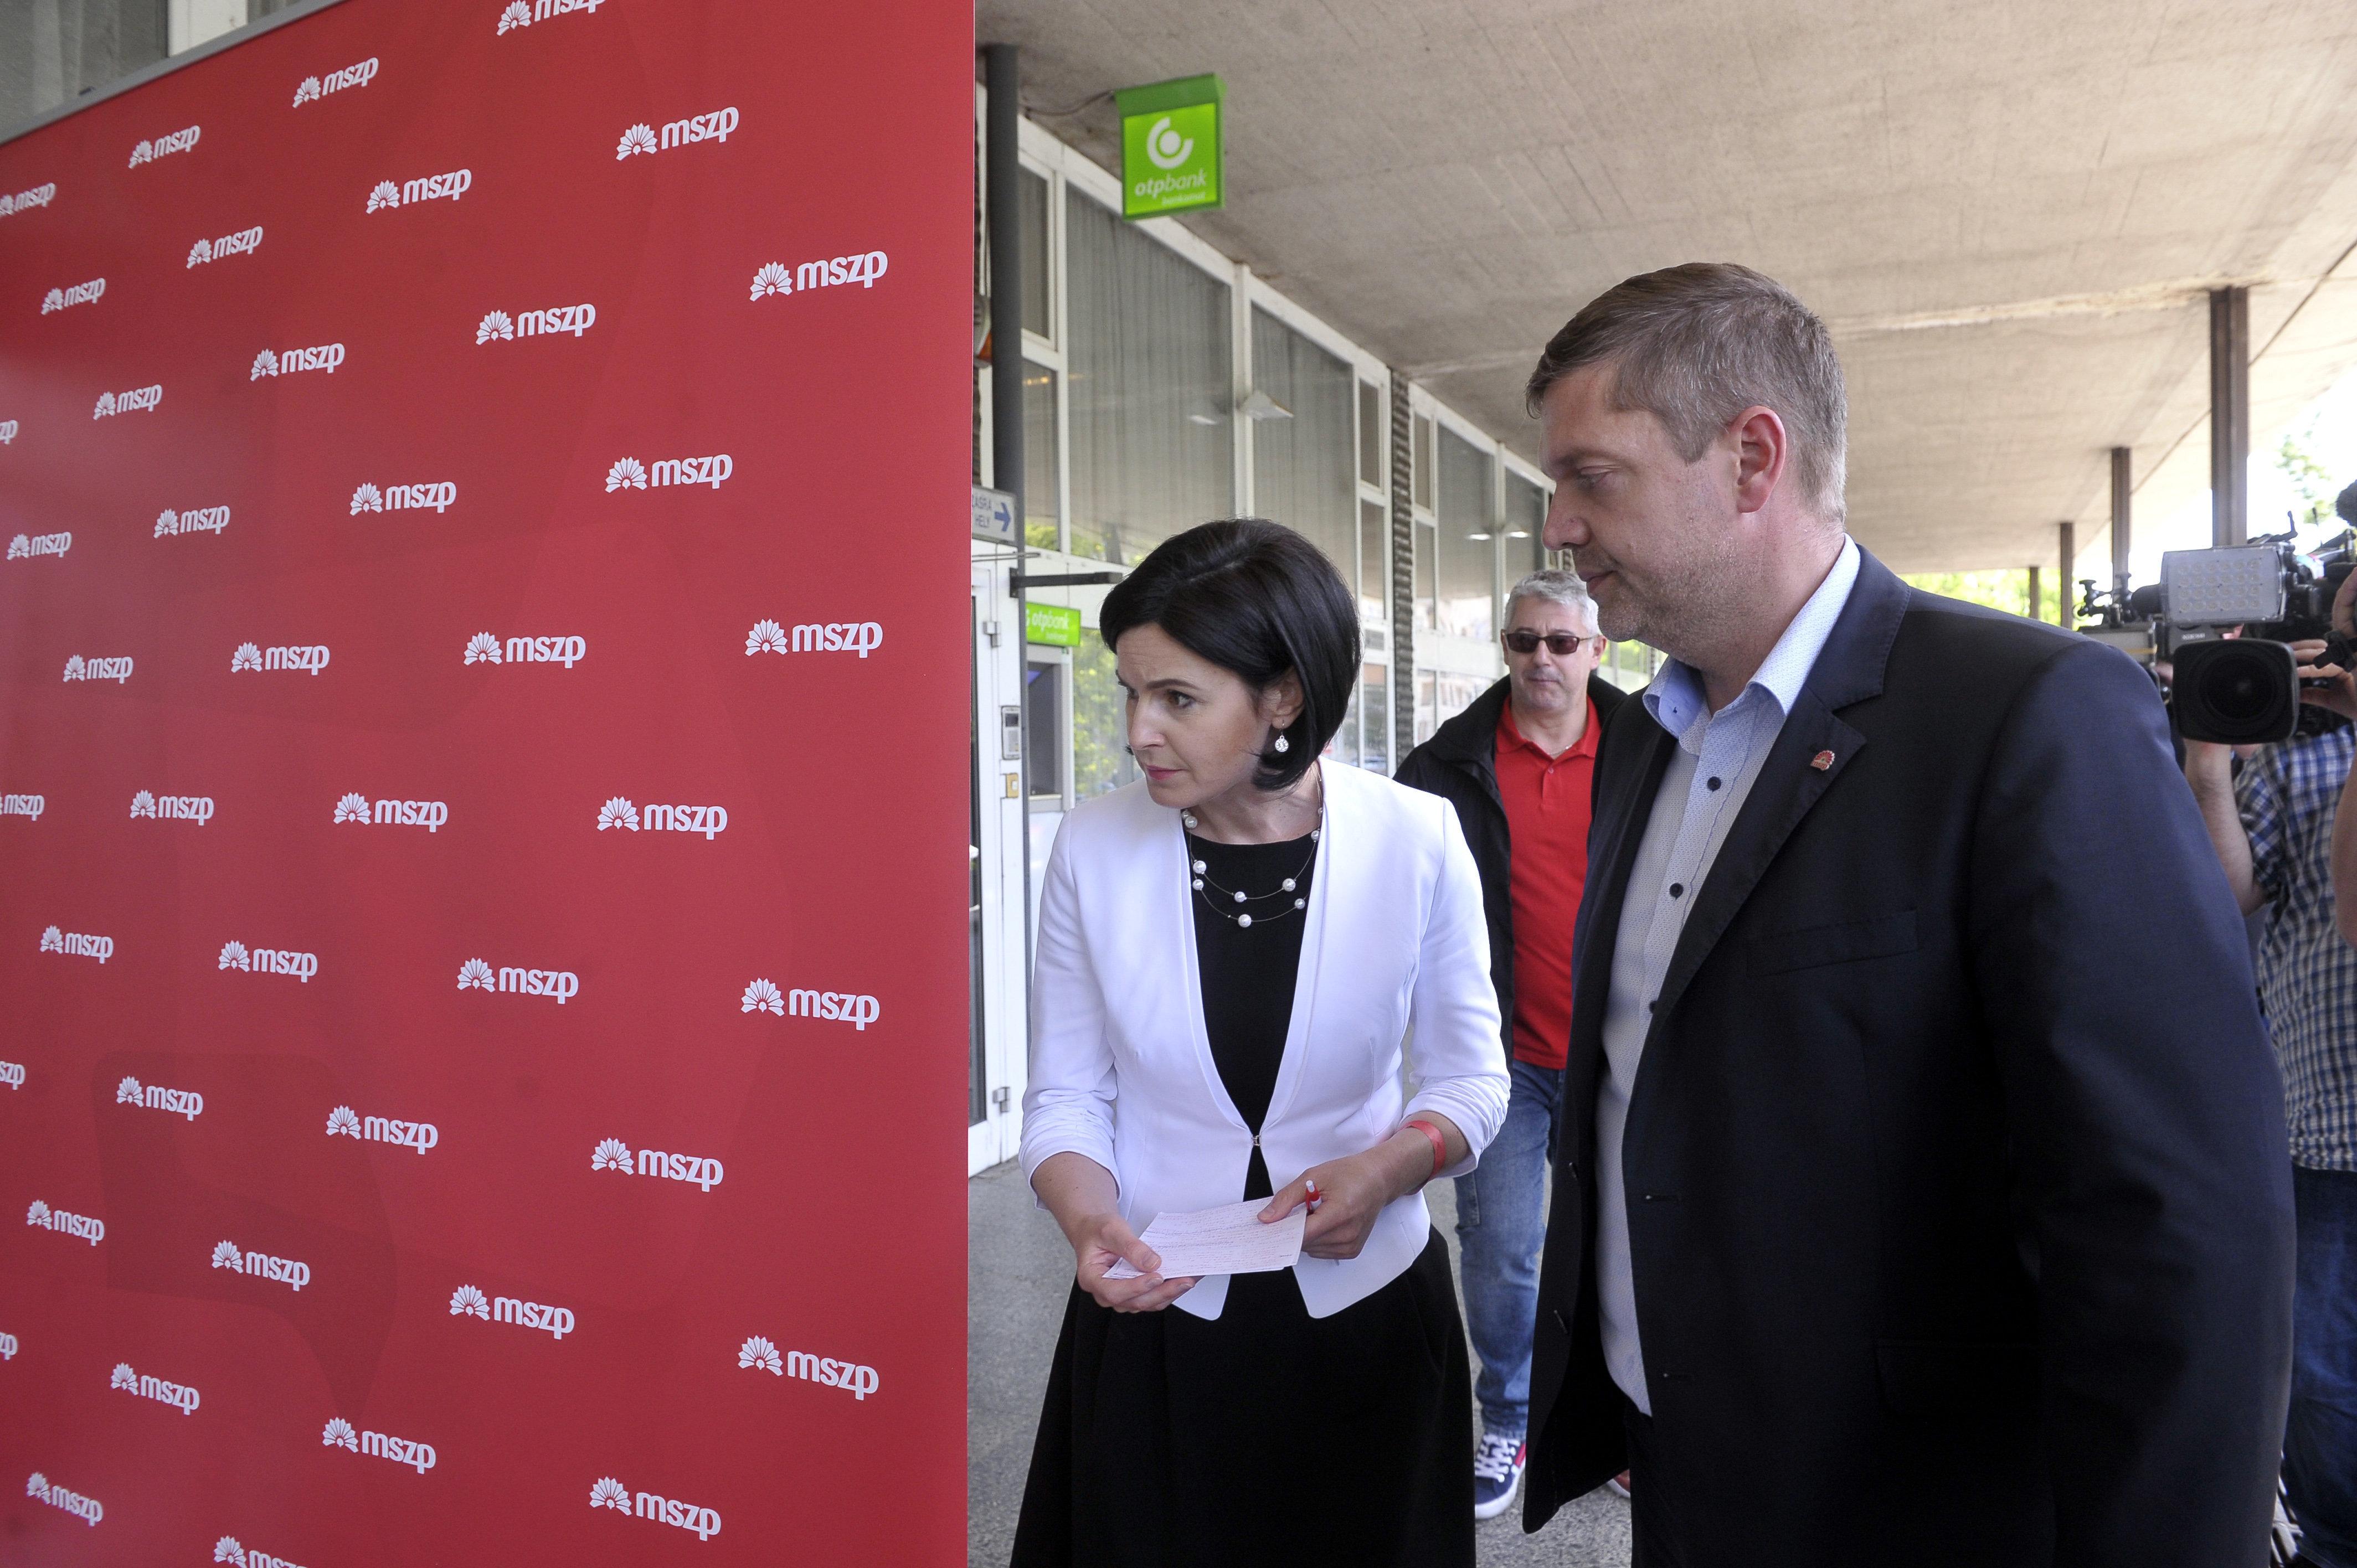 EP-Wahl – Ujhelyi erhält MSZP-Párbeszéd Mandat post's picture